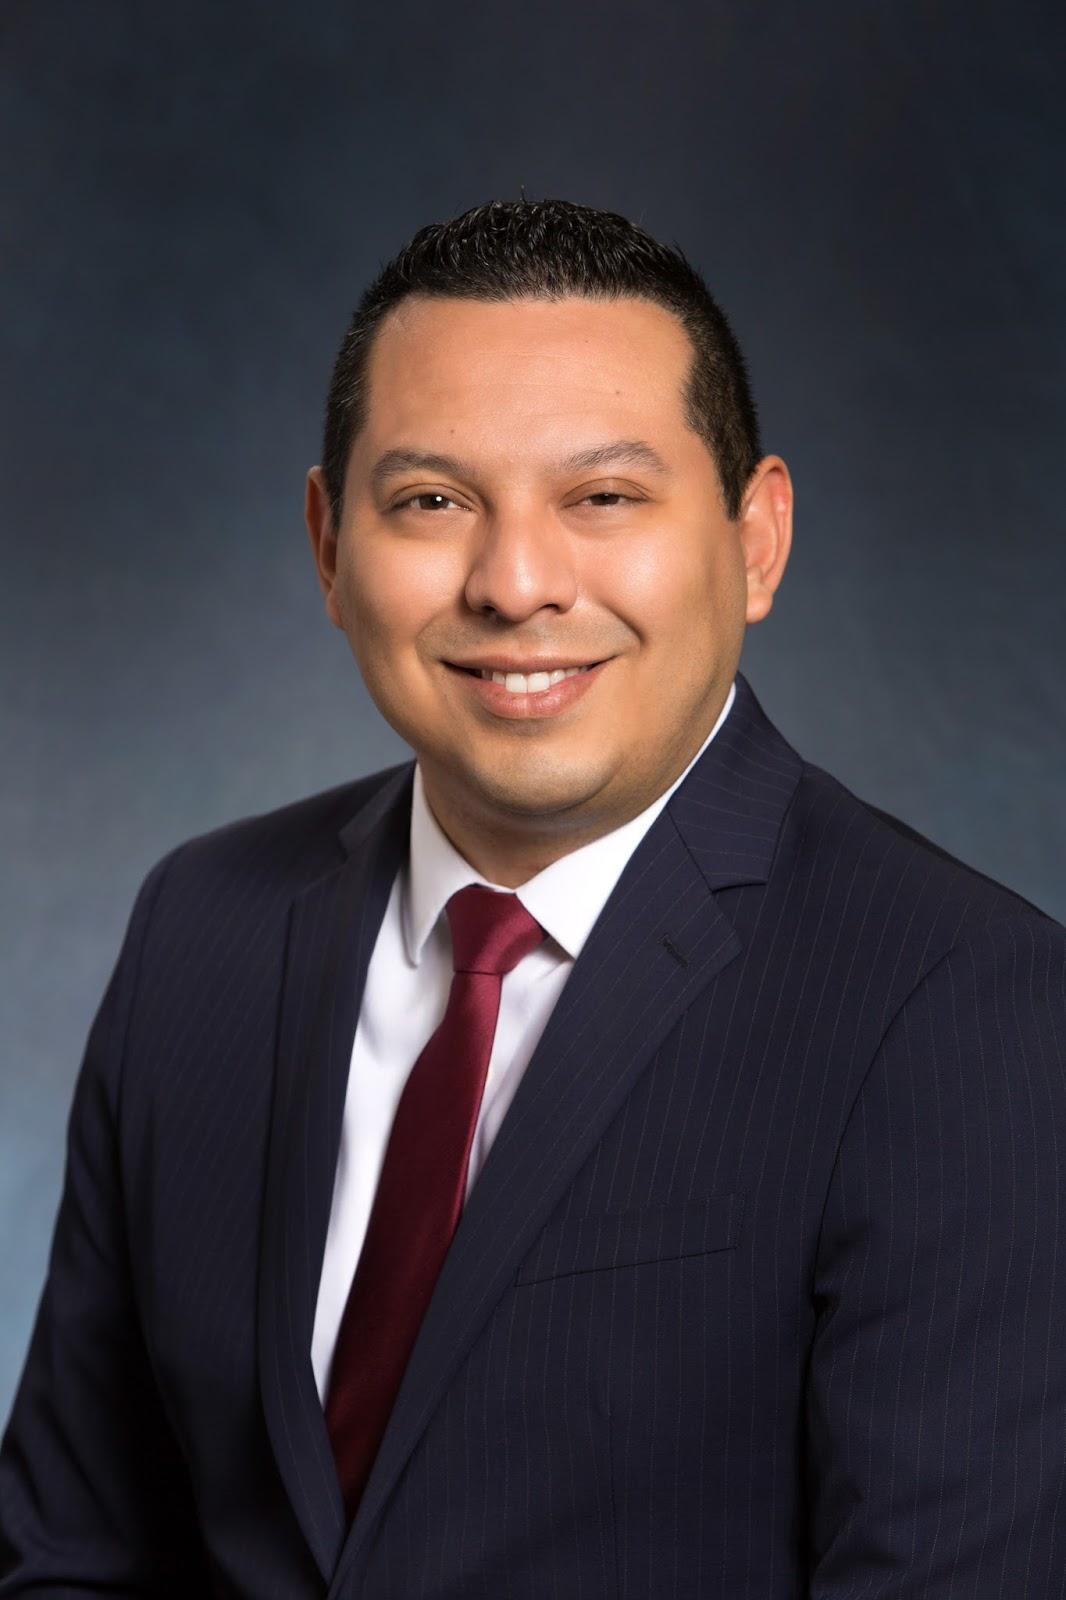 Dr  Joseph Martinez Joins Texas Orthopedics   Texas Orthopedics